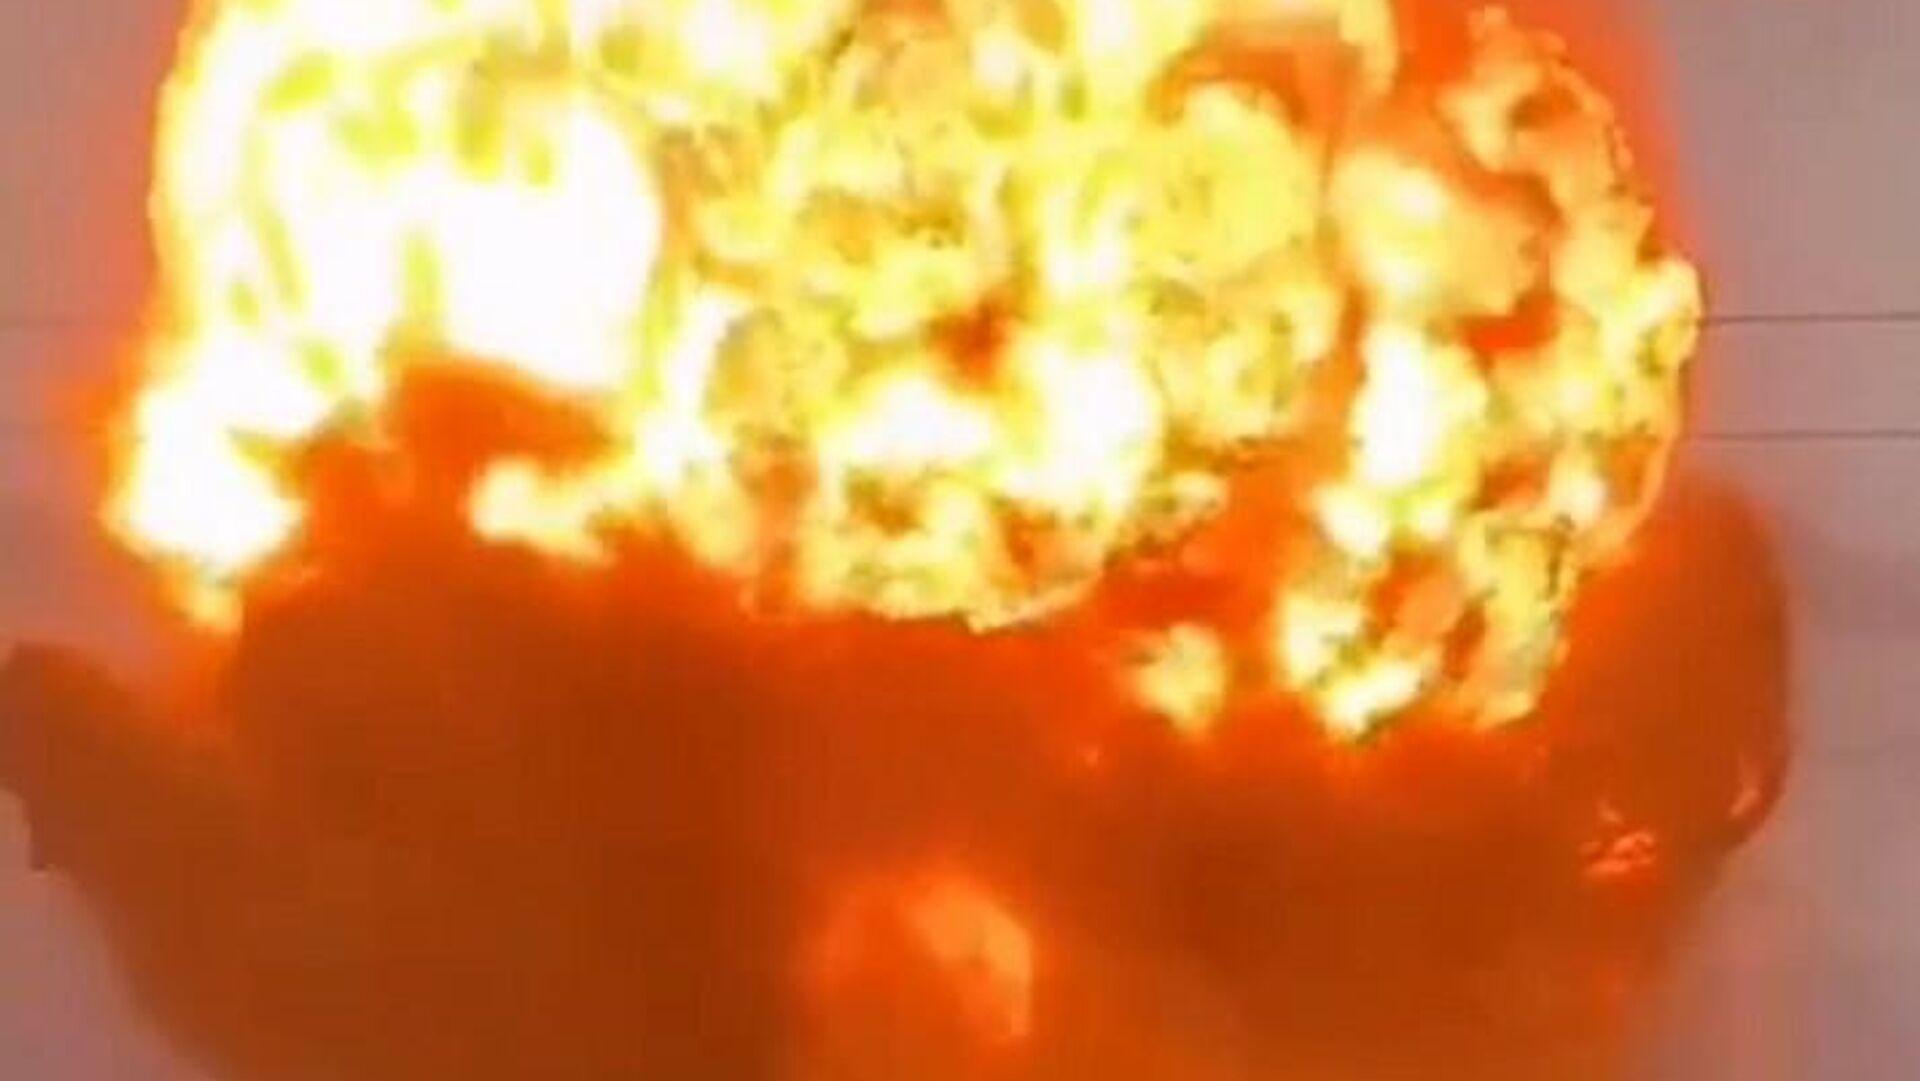 L'esplosione nella città meridionale di Taraz, in Kazakistan - Sputnik Italia, 1920, 26.08.2021